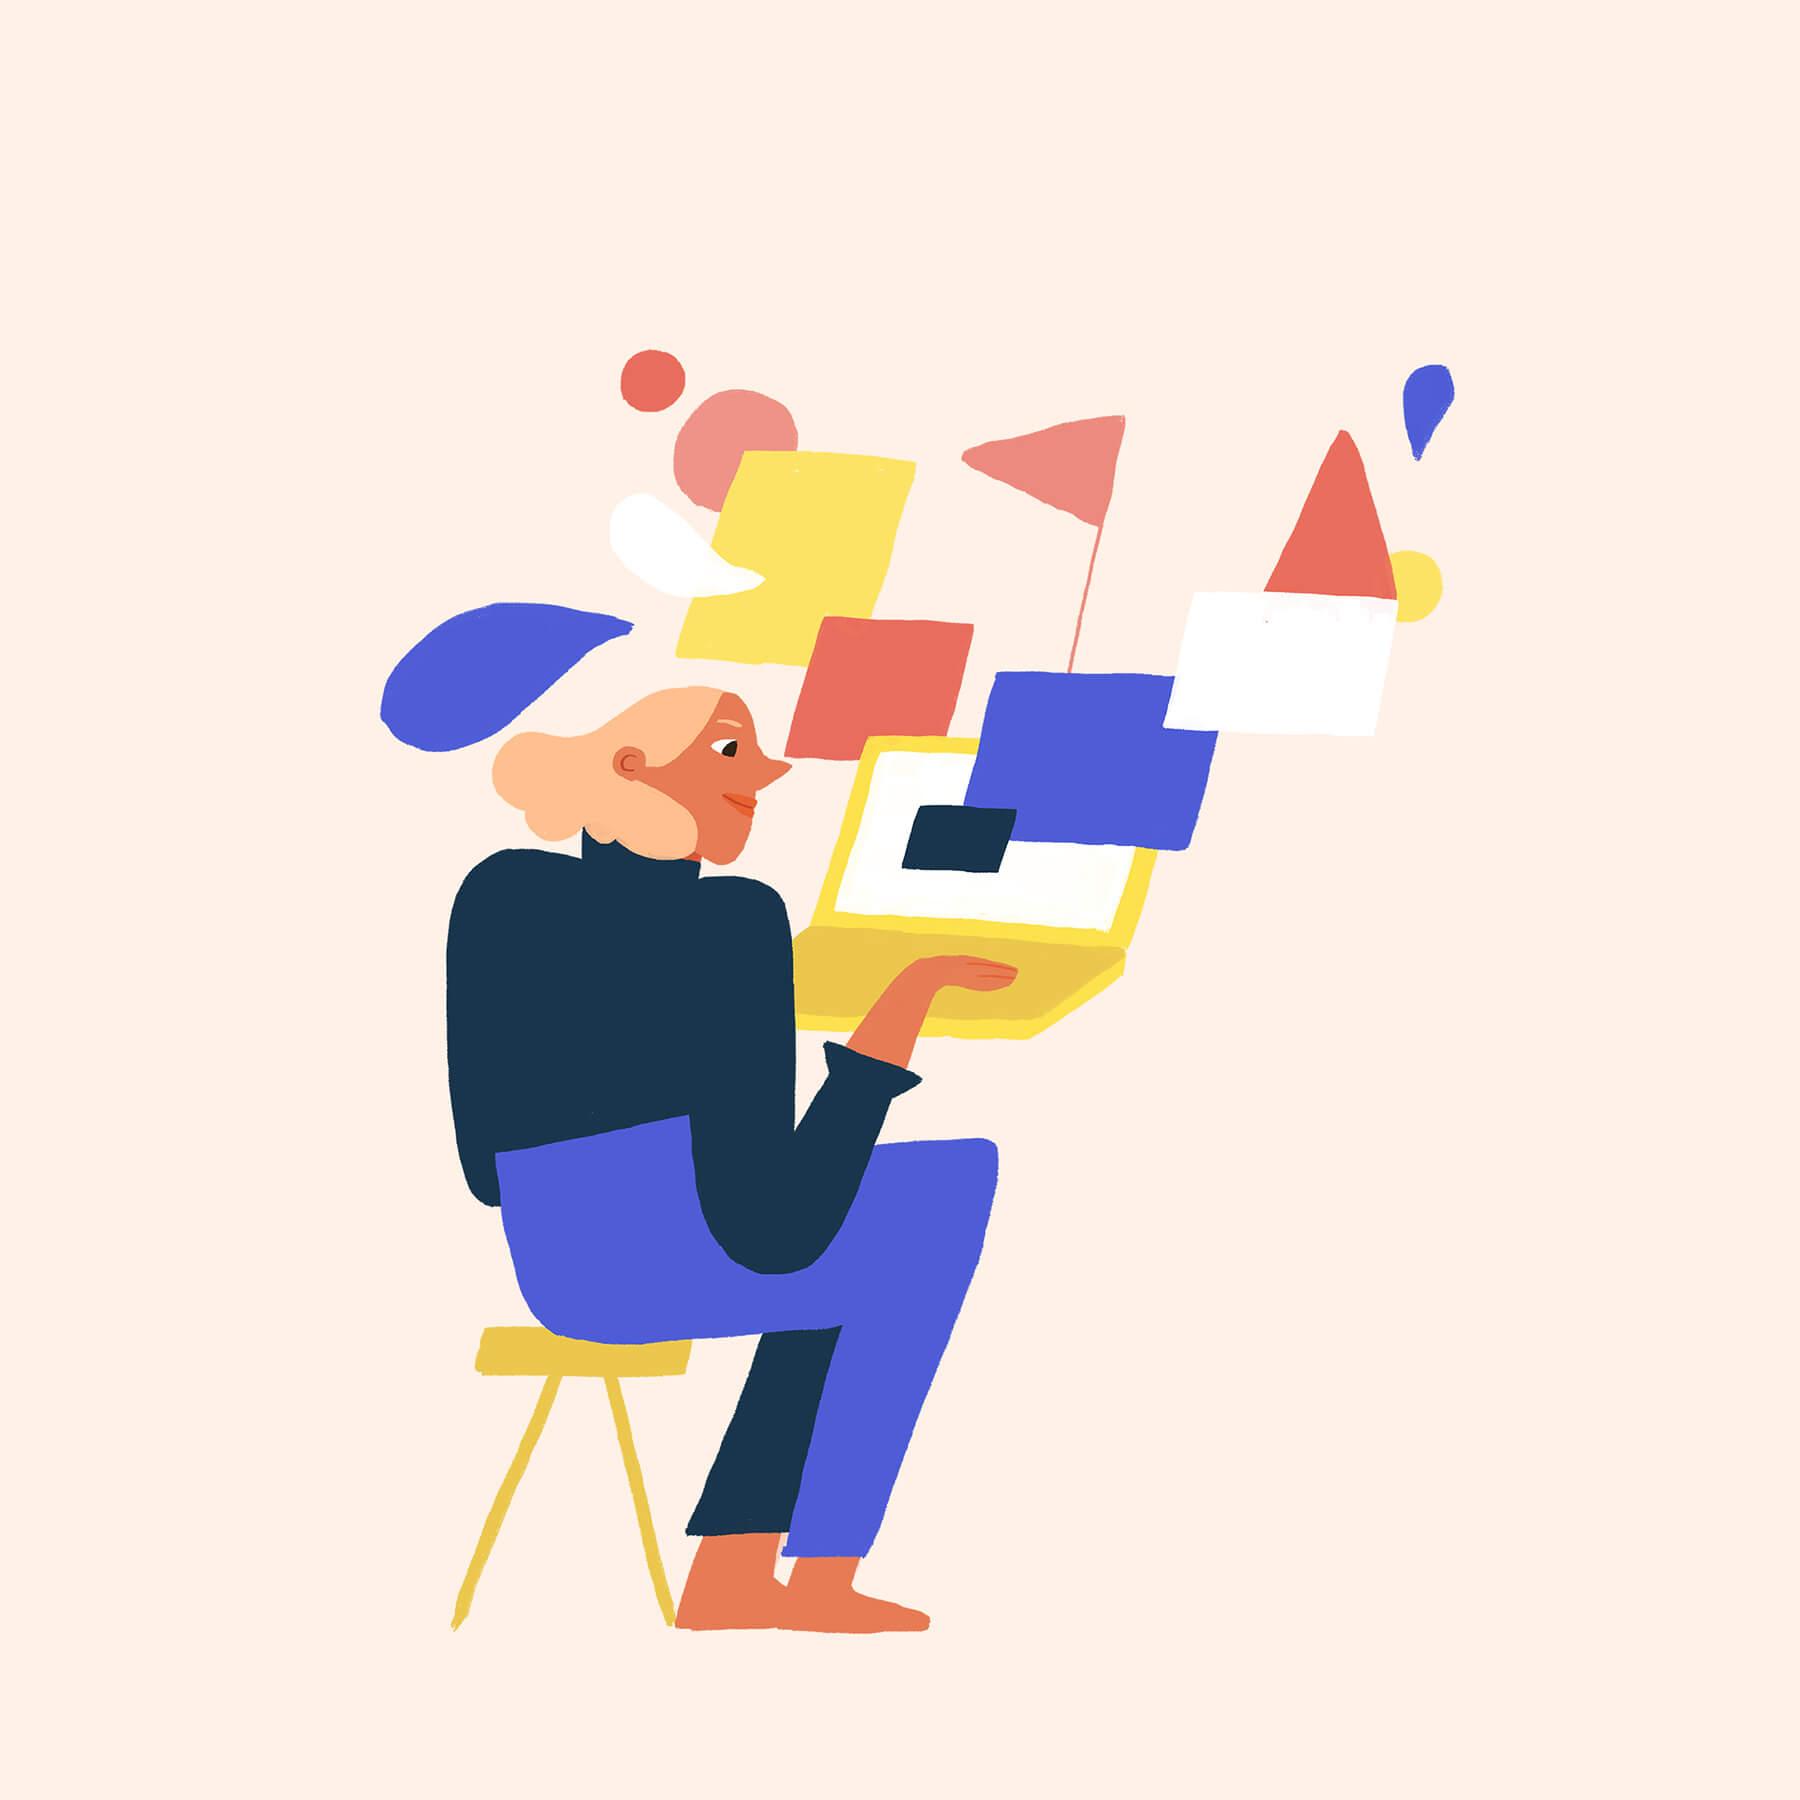 woman-internet-communication-search-building-illustration-violeta-noy